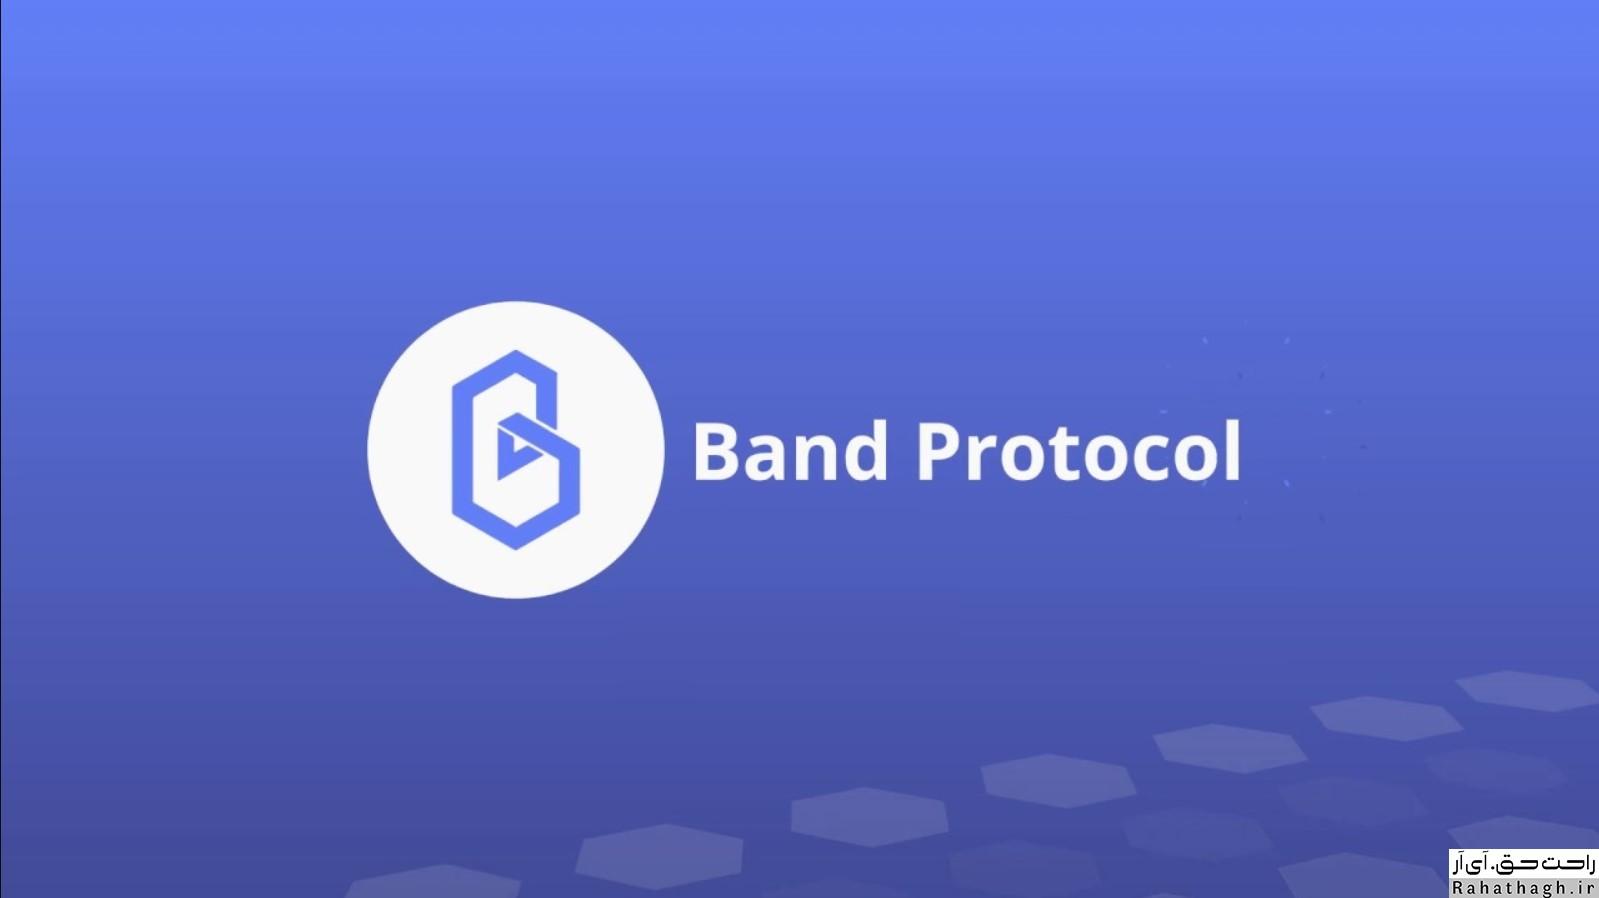 https://s19.picofile.com/file/8431572142/band_protocol_%D8%B1%D8%A7%D8%AD%D8%AA_%D8%AD%D9%82.jpg